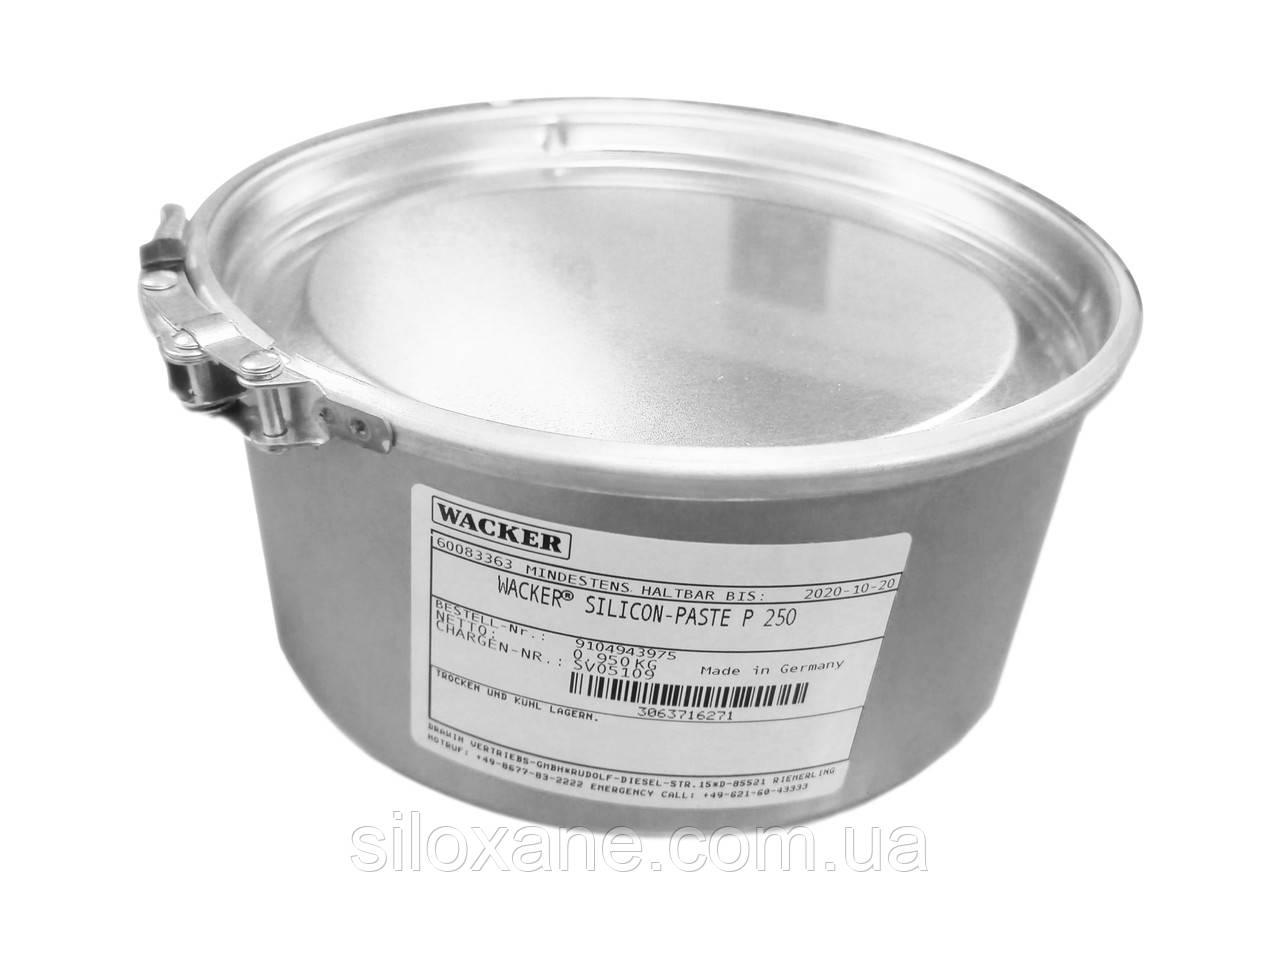 WACKER® SILICONE PASTE P 250 Силіконова паста середньої твердості, банку 950 гр